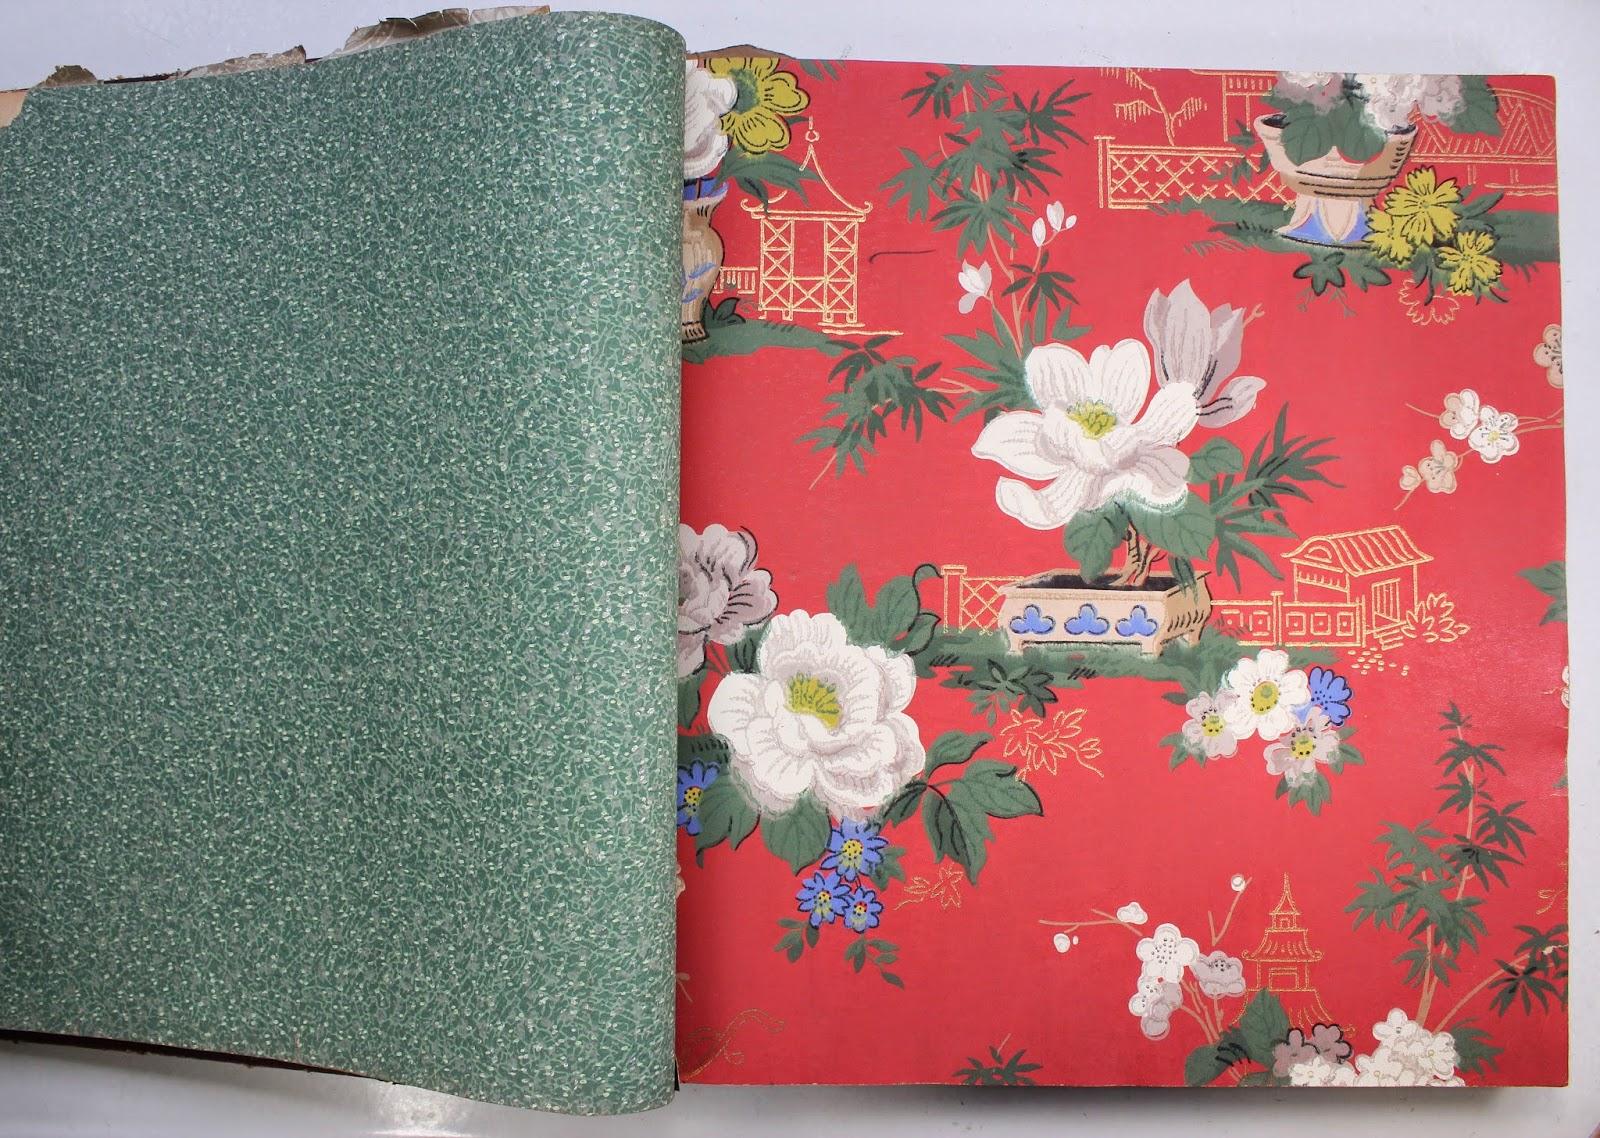 wallpaper sample book - photo #9